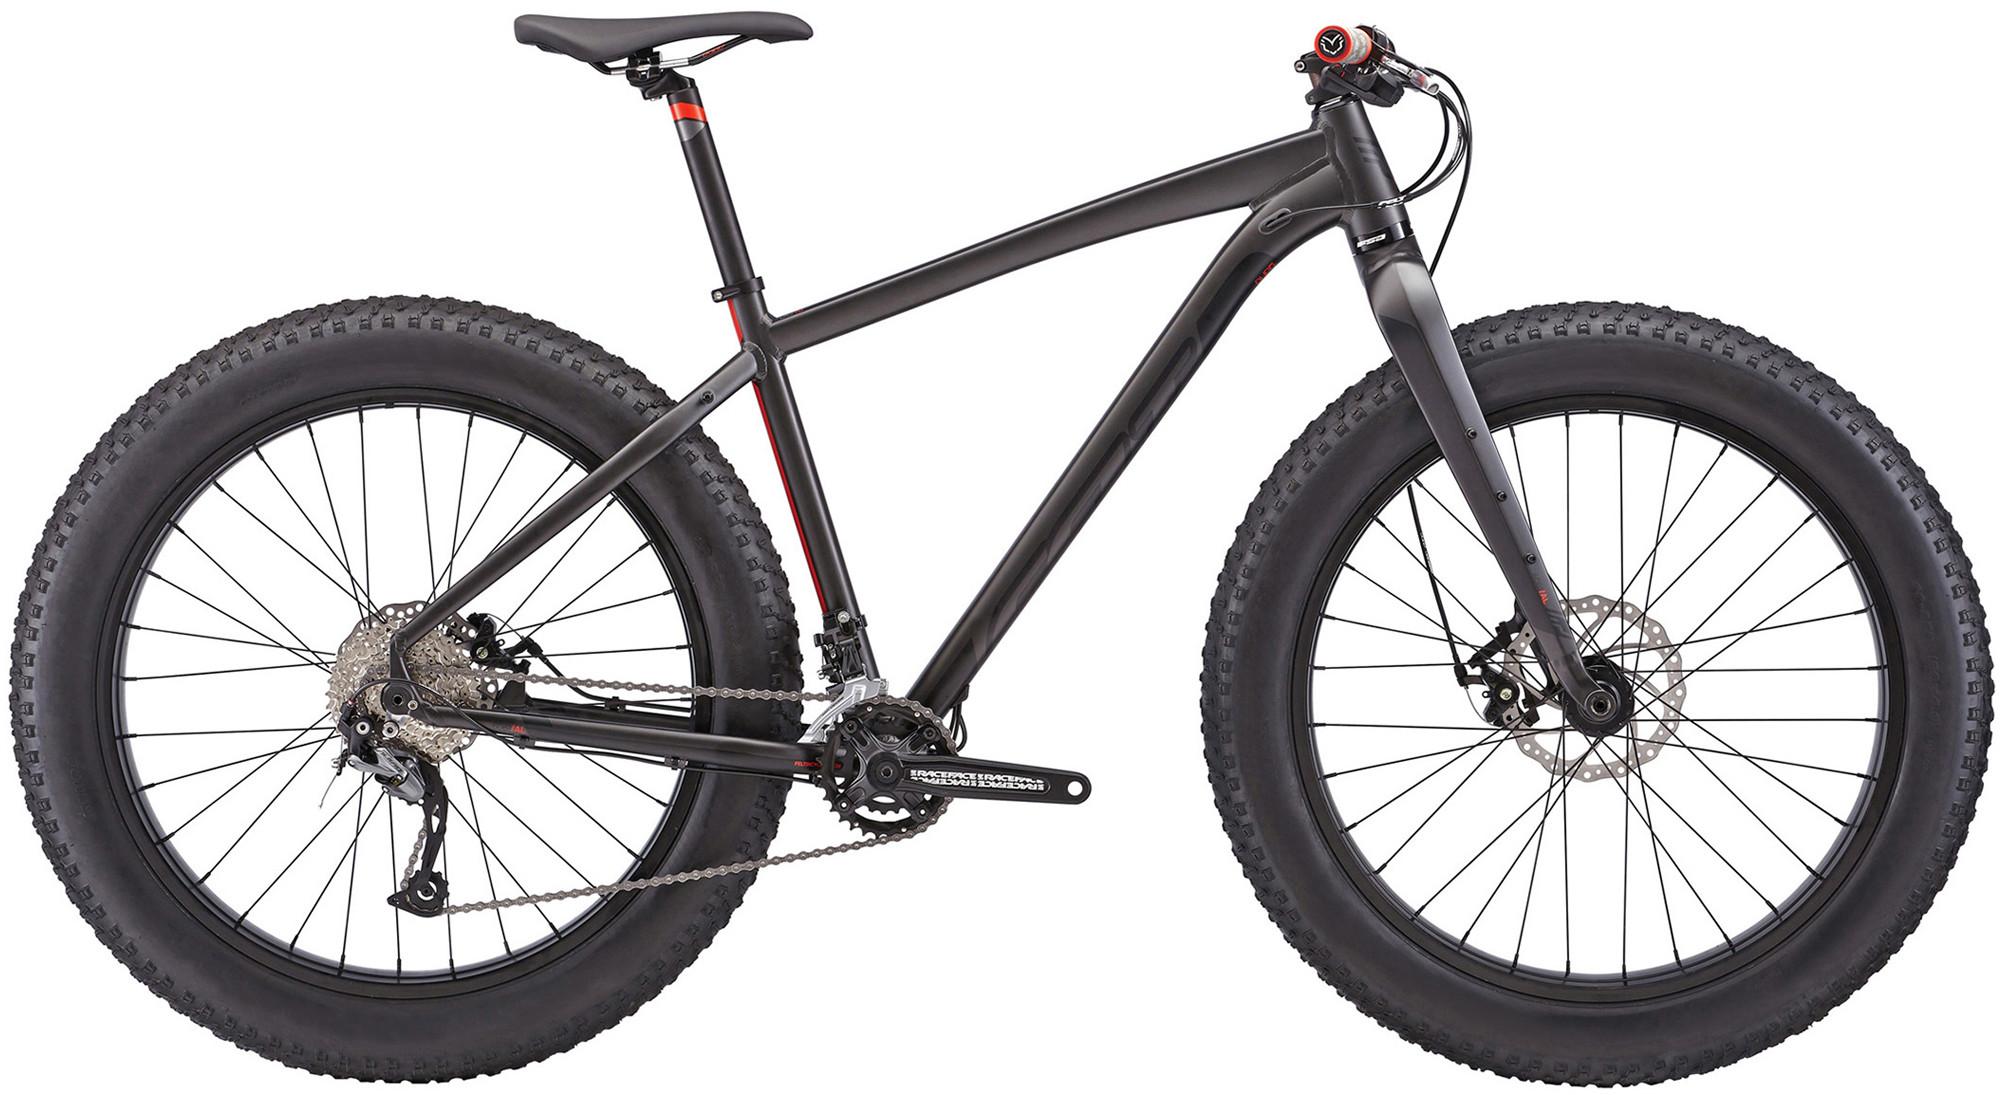 16782_felt_doubledouble_70_mountain_bike_2015